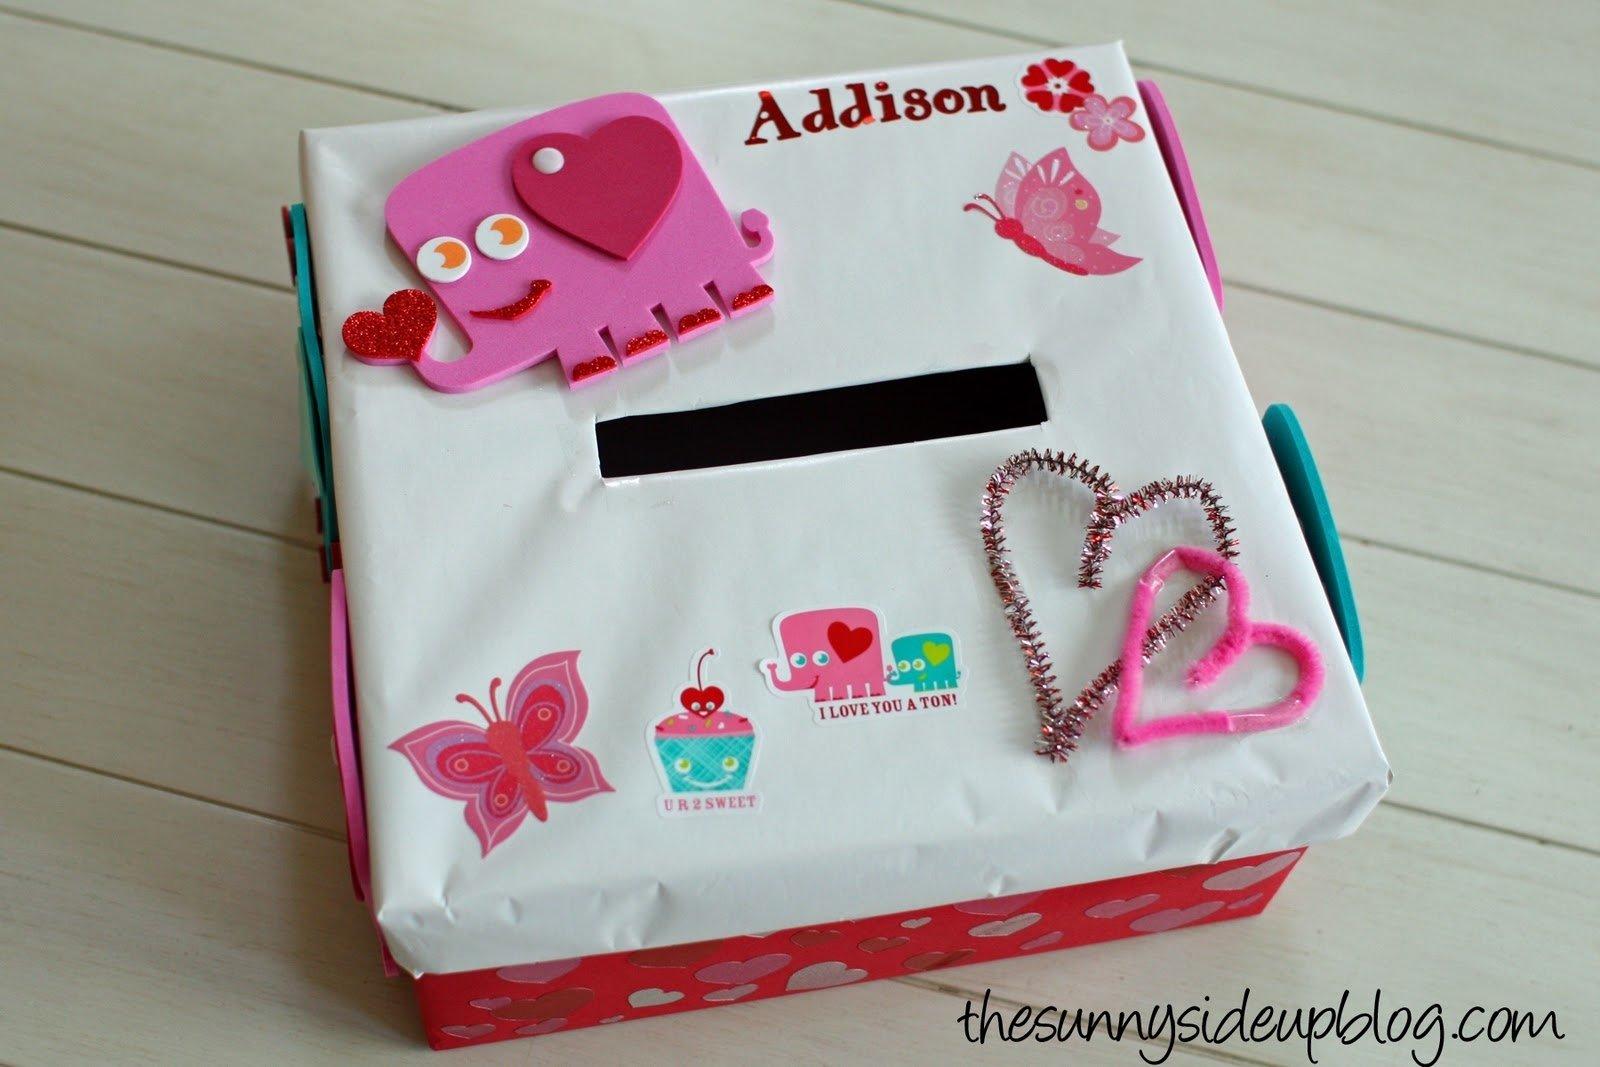 10 Stylish Valentine Shoe Box Decorating Ideas a valentines box the sunny side up blog 2021